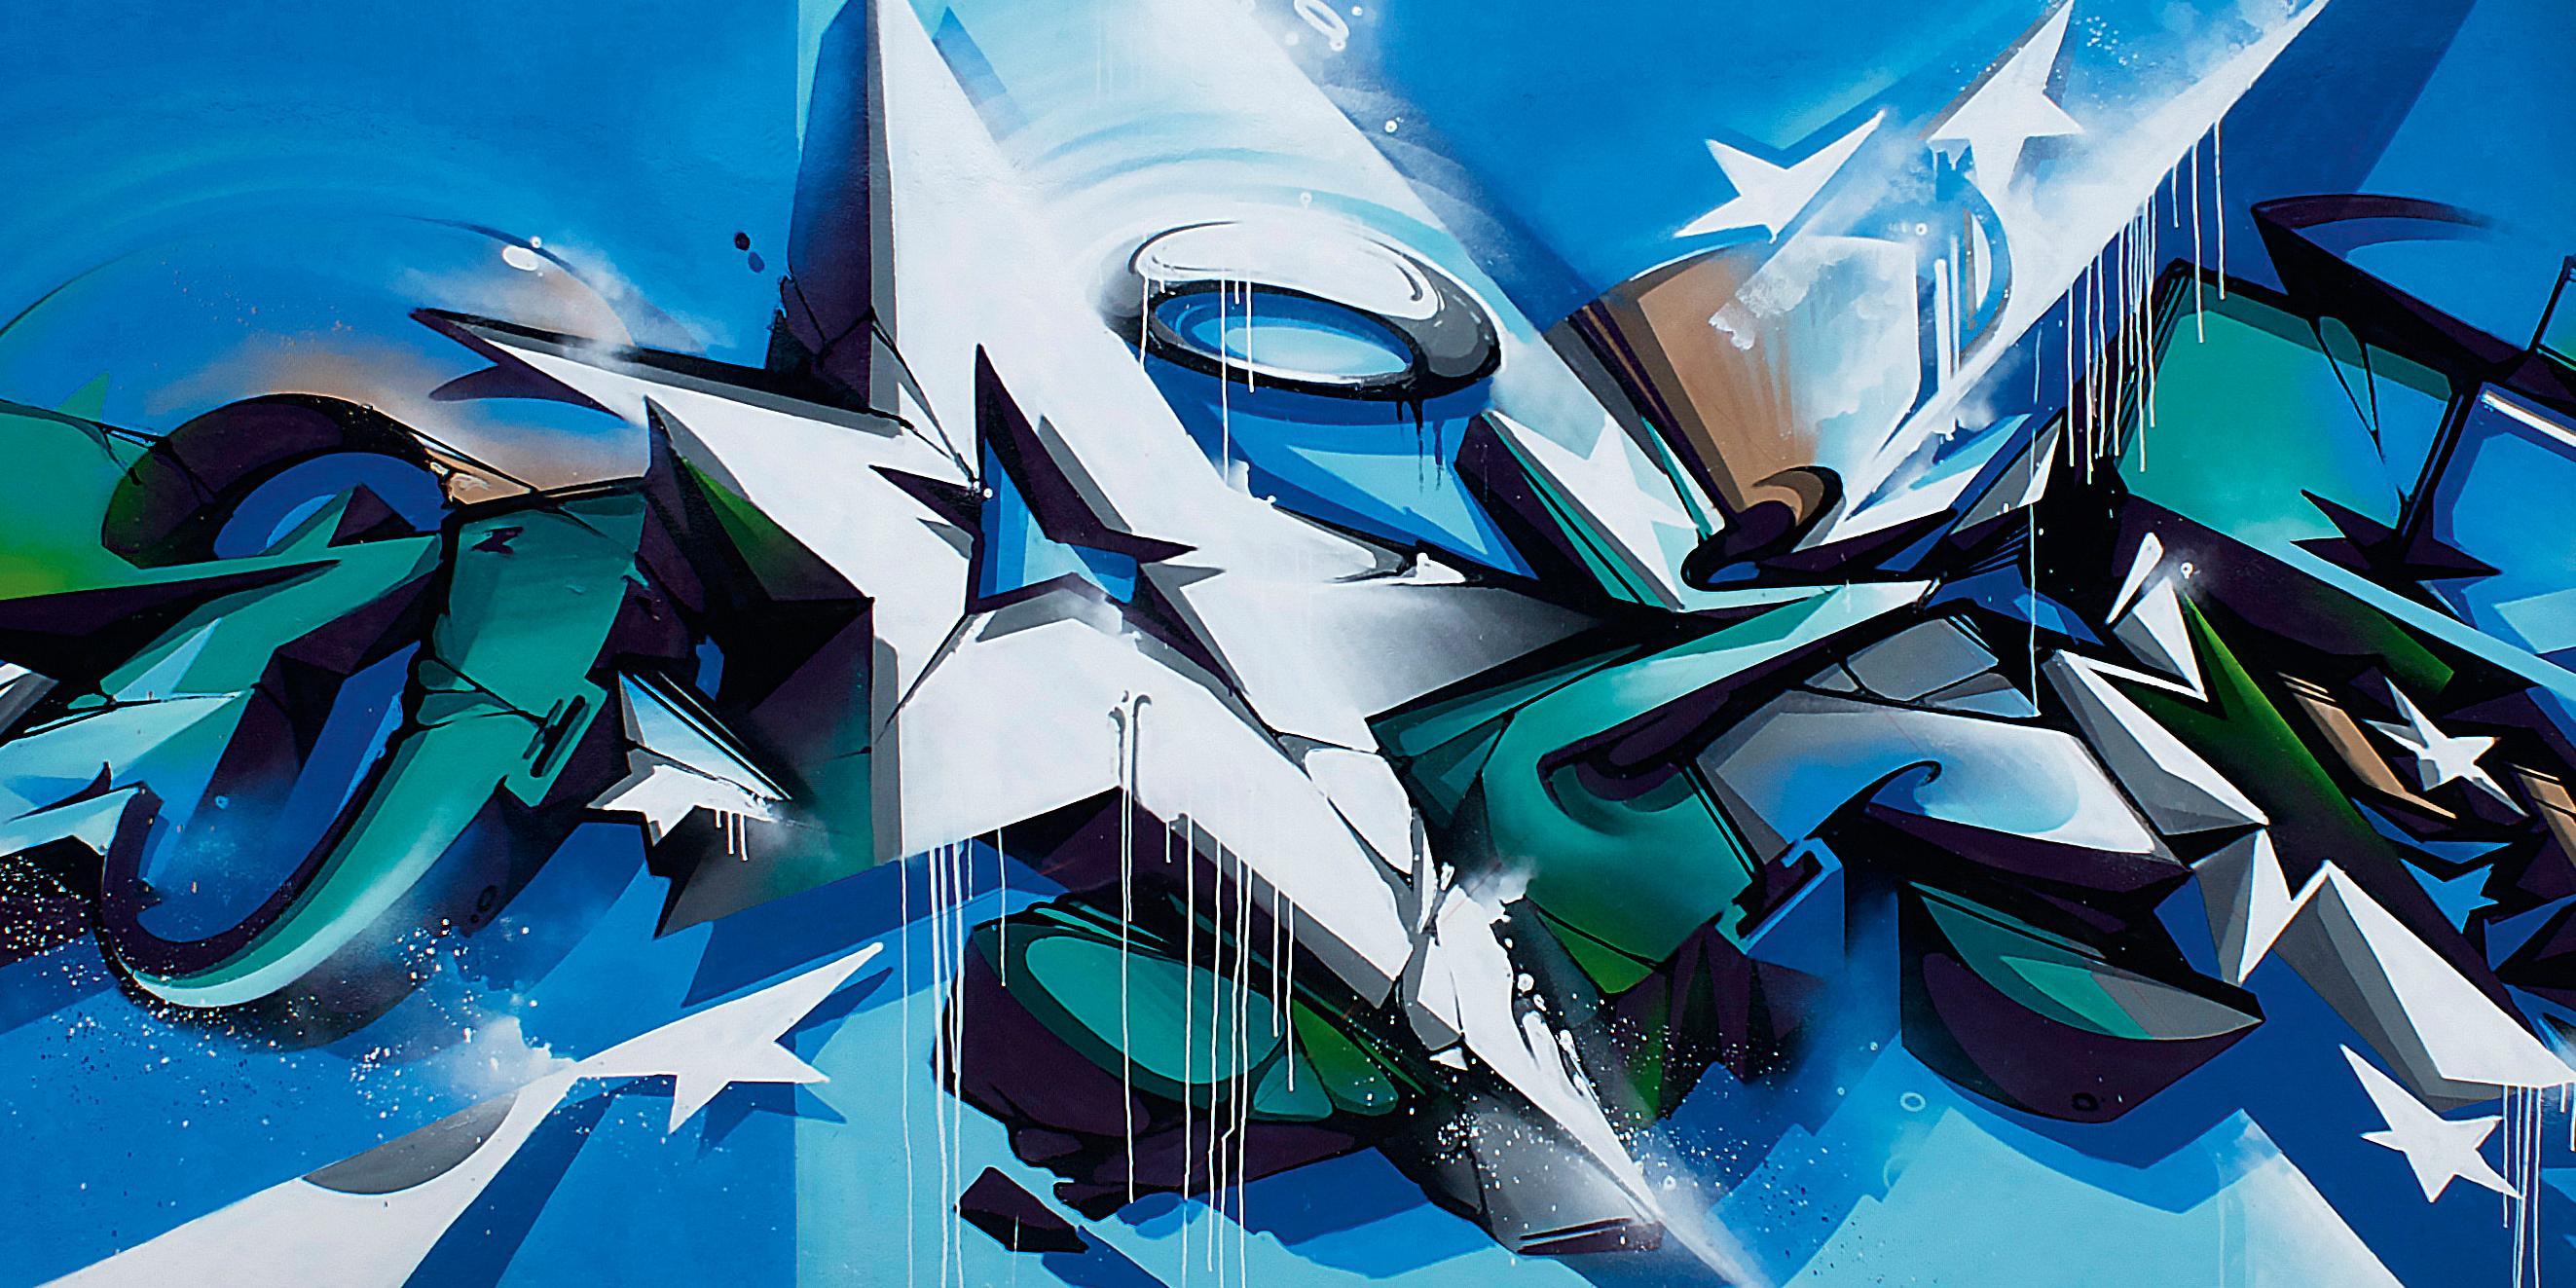 A work by Does - Rio de Janeiro brazil mural